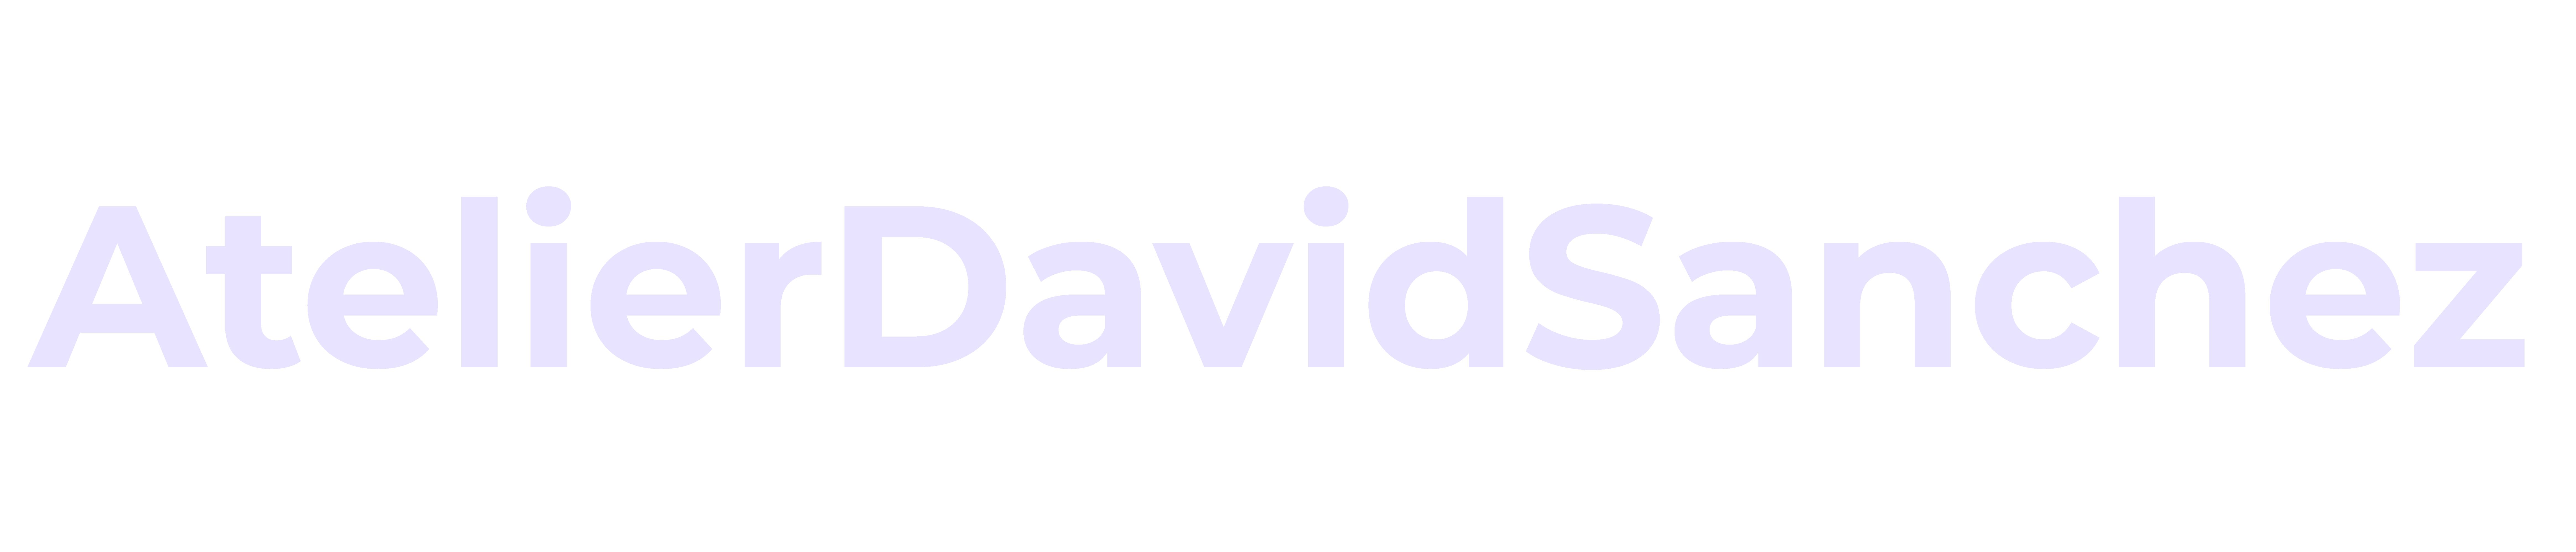 AtelierDavidSanchez